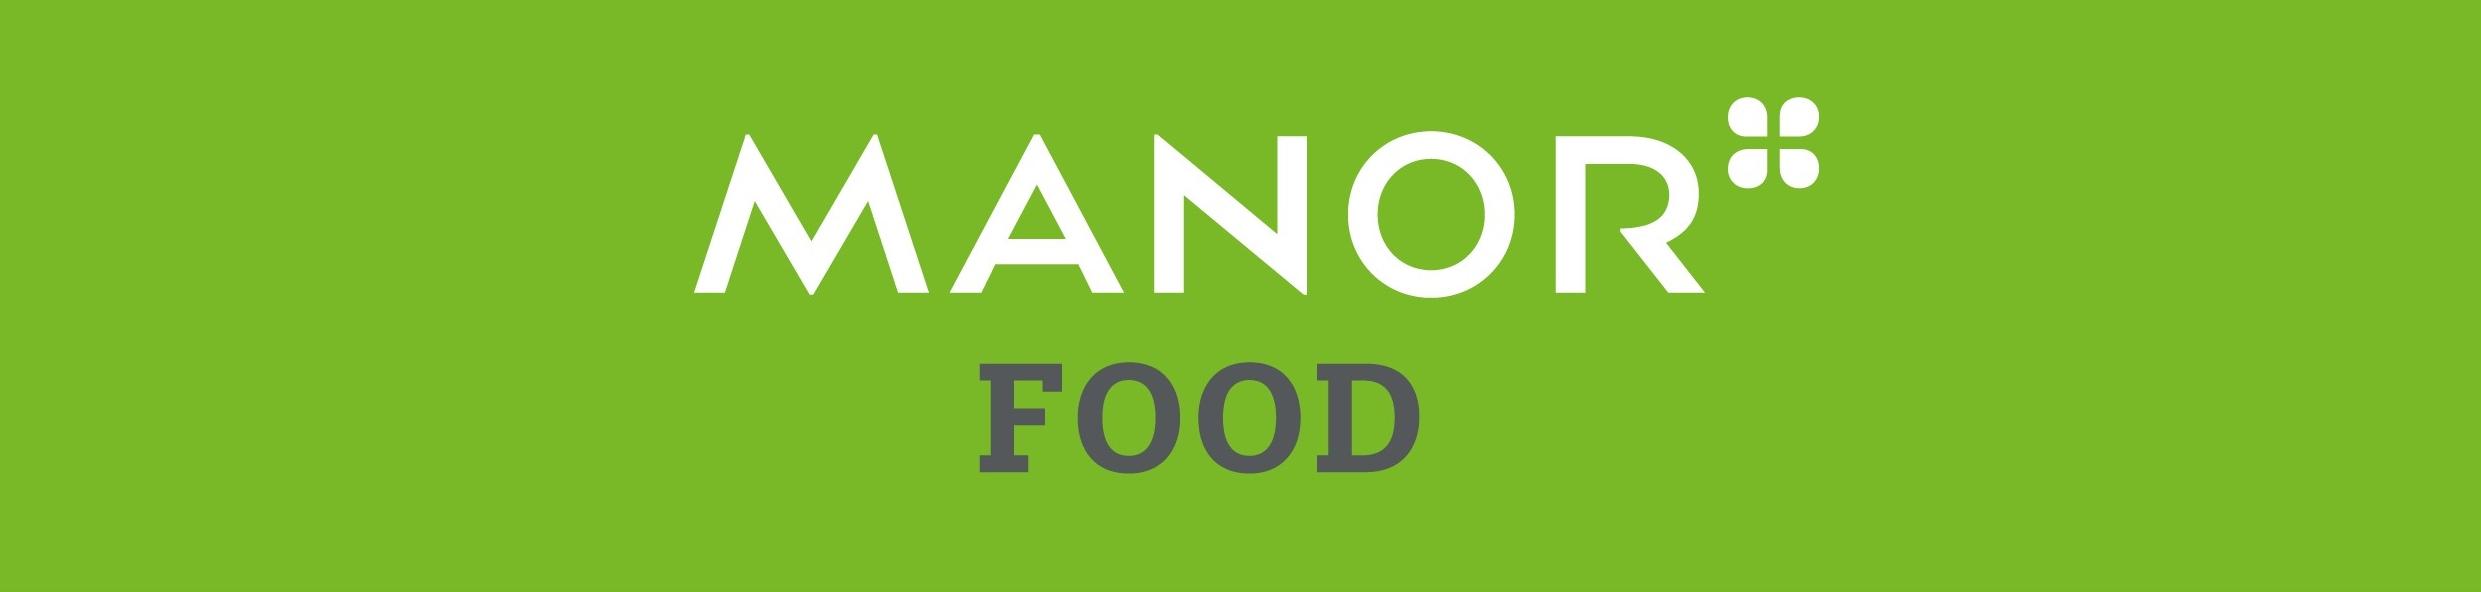 Logo_Manor_Food.jpg